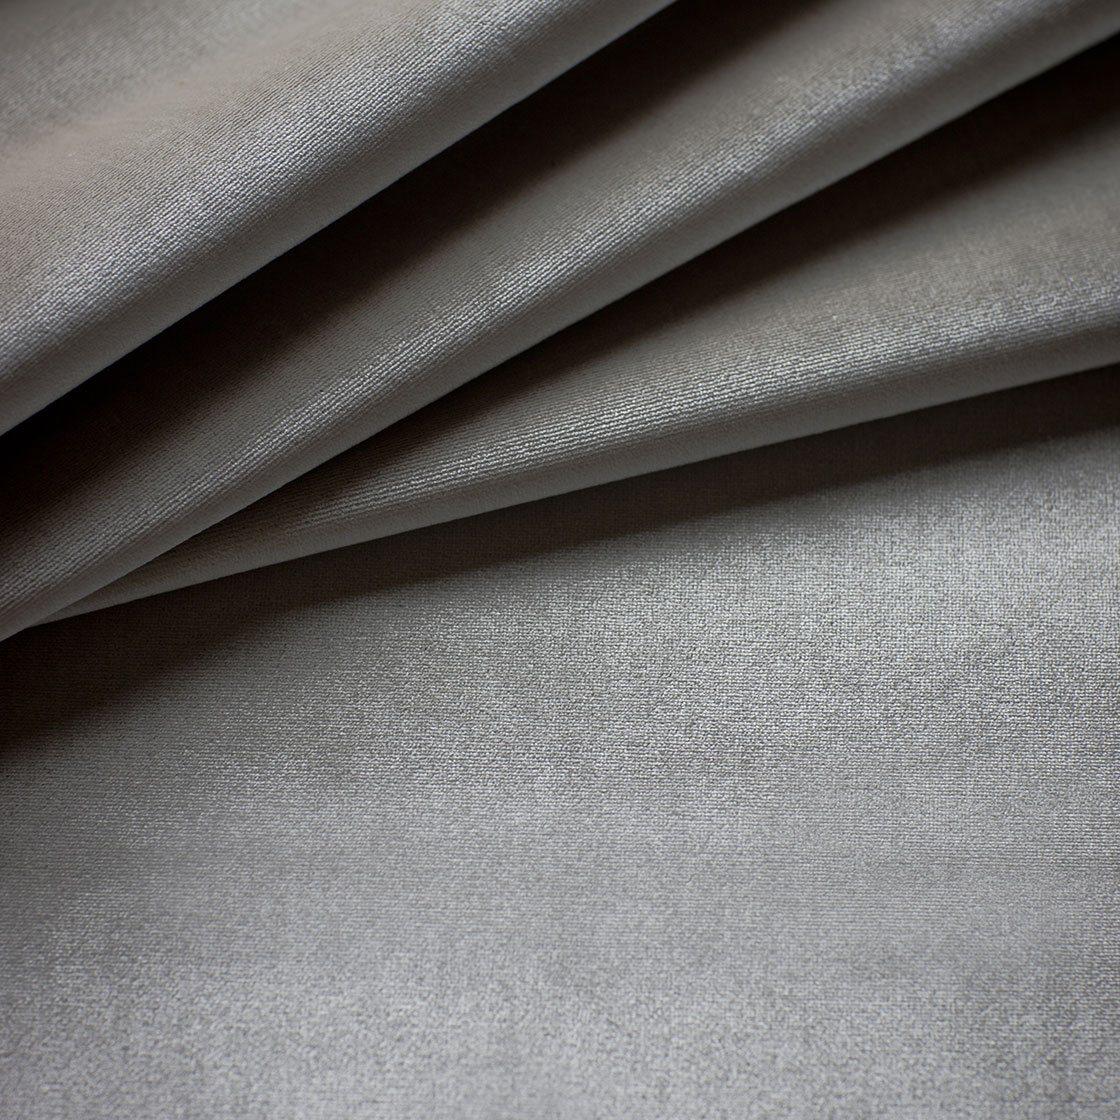 Capri Silk Velvet - Stone - Beaumont & Fletcher - Beaumont & Fletcher